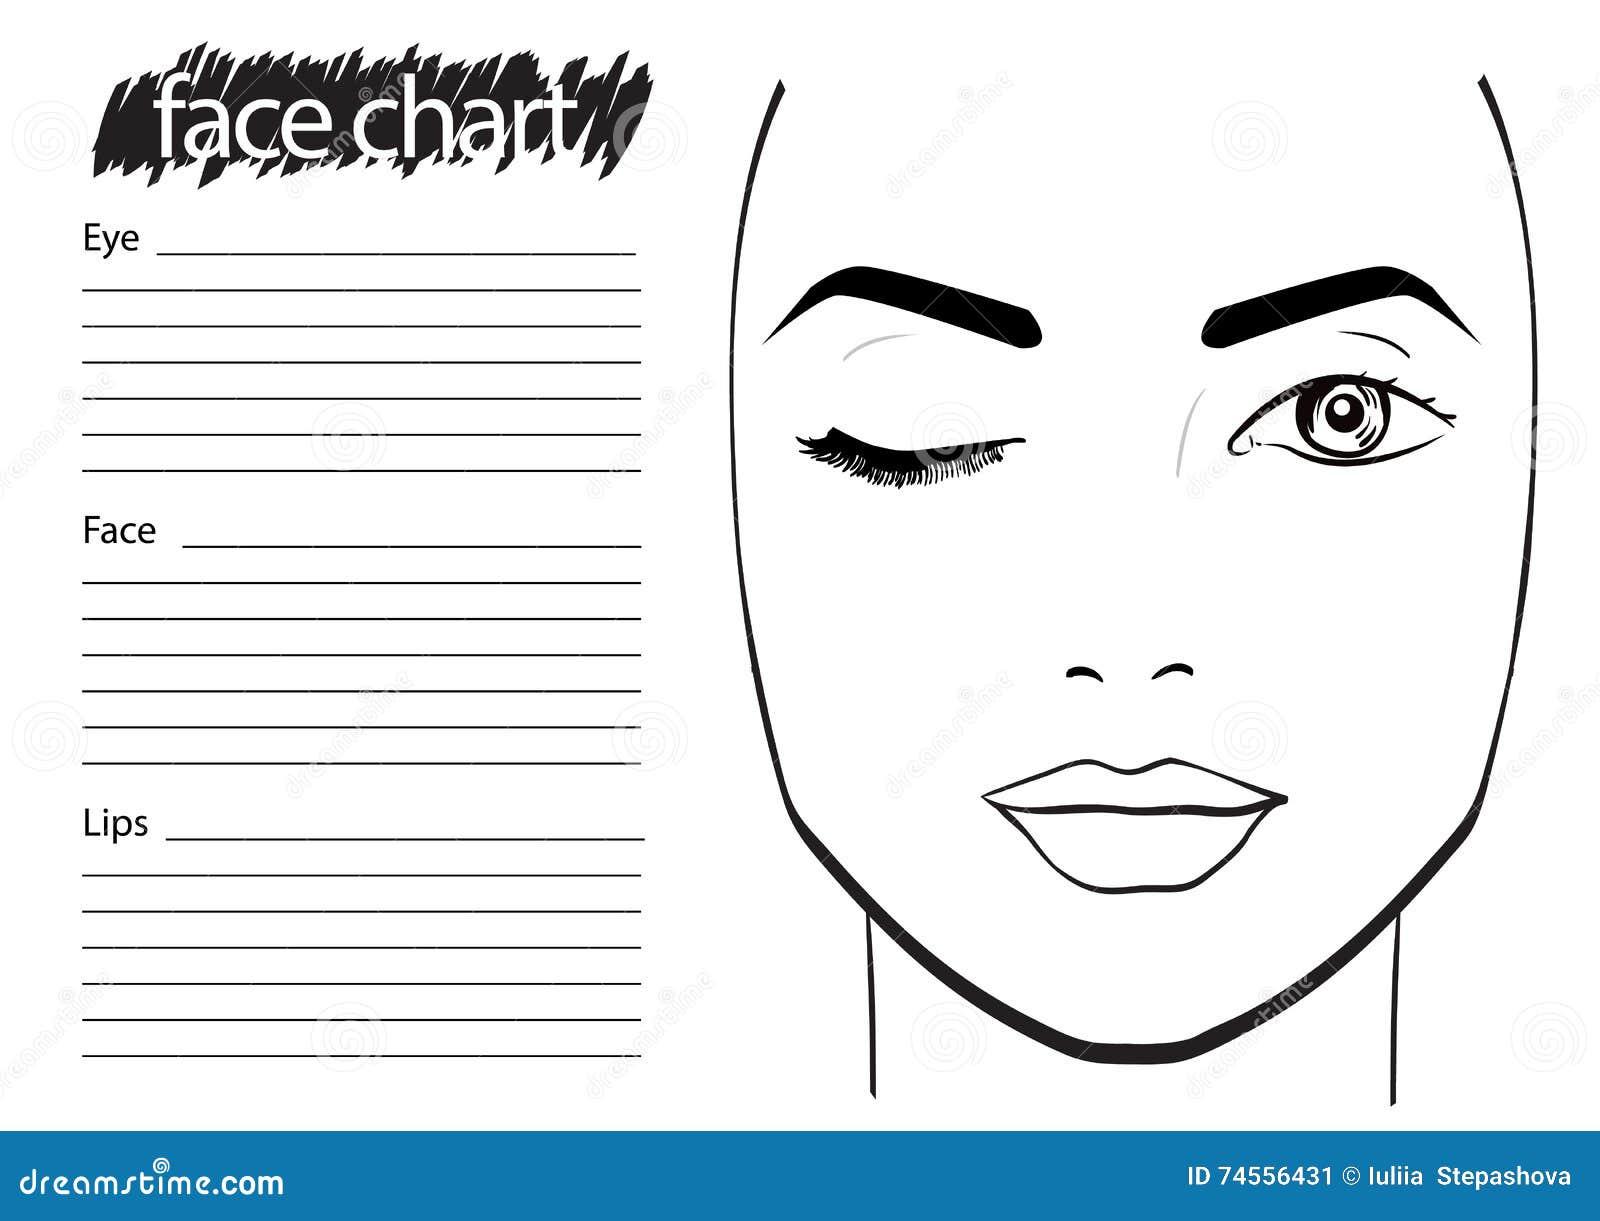 Face Chart Makeup Artist Blank Stock Illustration Illustration Of Fashion Element 74556431